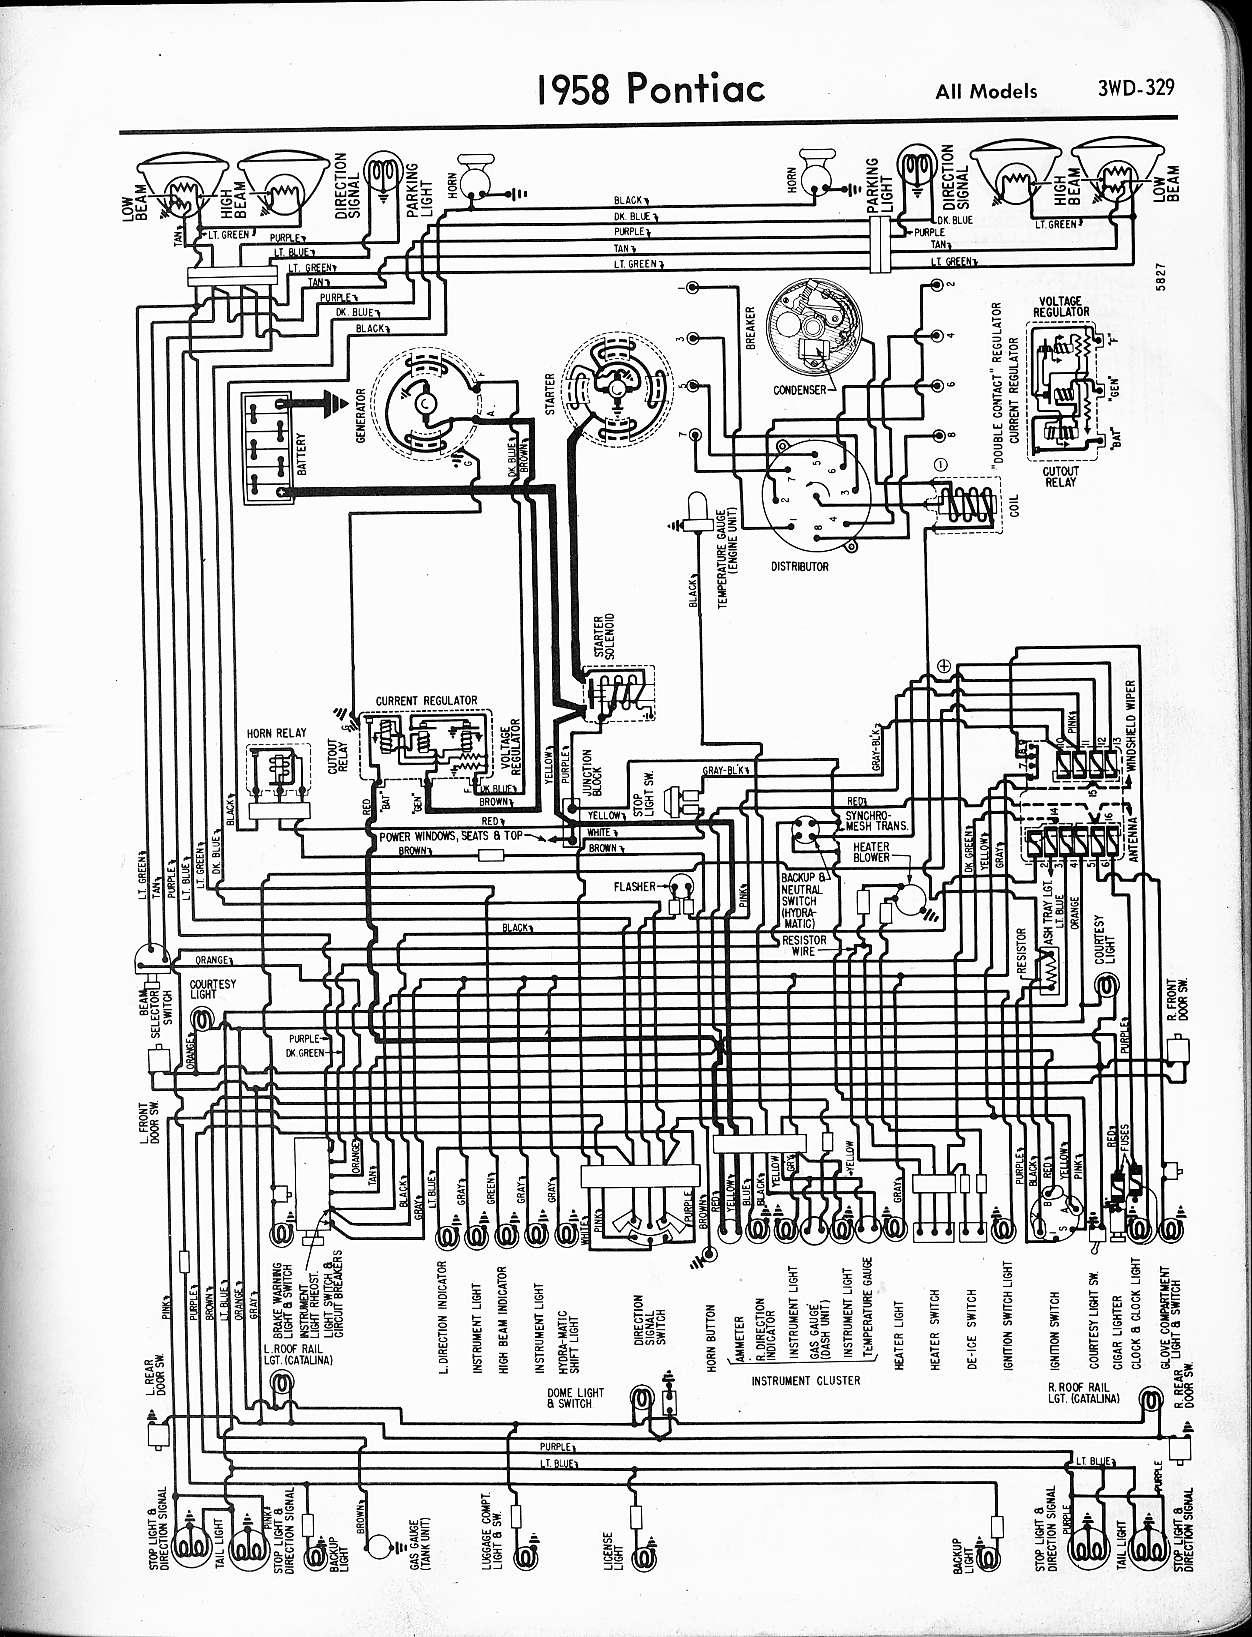 Brilliant Wiring Diagram For 1959 Buick All Models Basic Electronics Wiring Wiring Cloud Photboapumohammedshrineorg